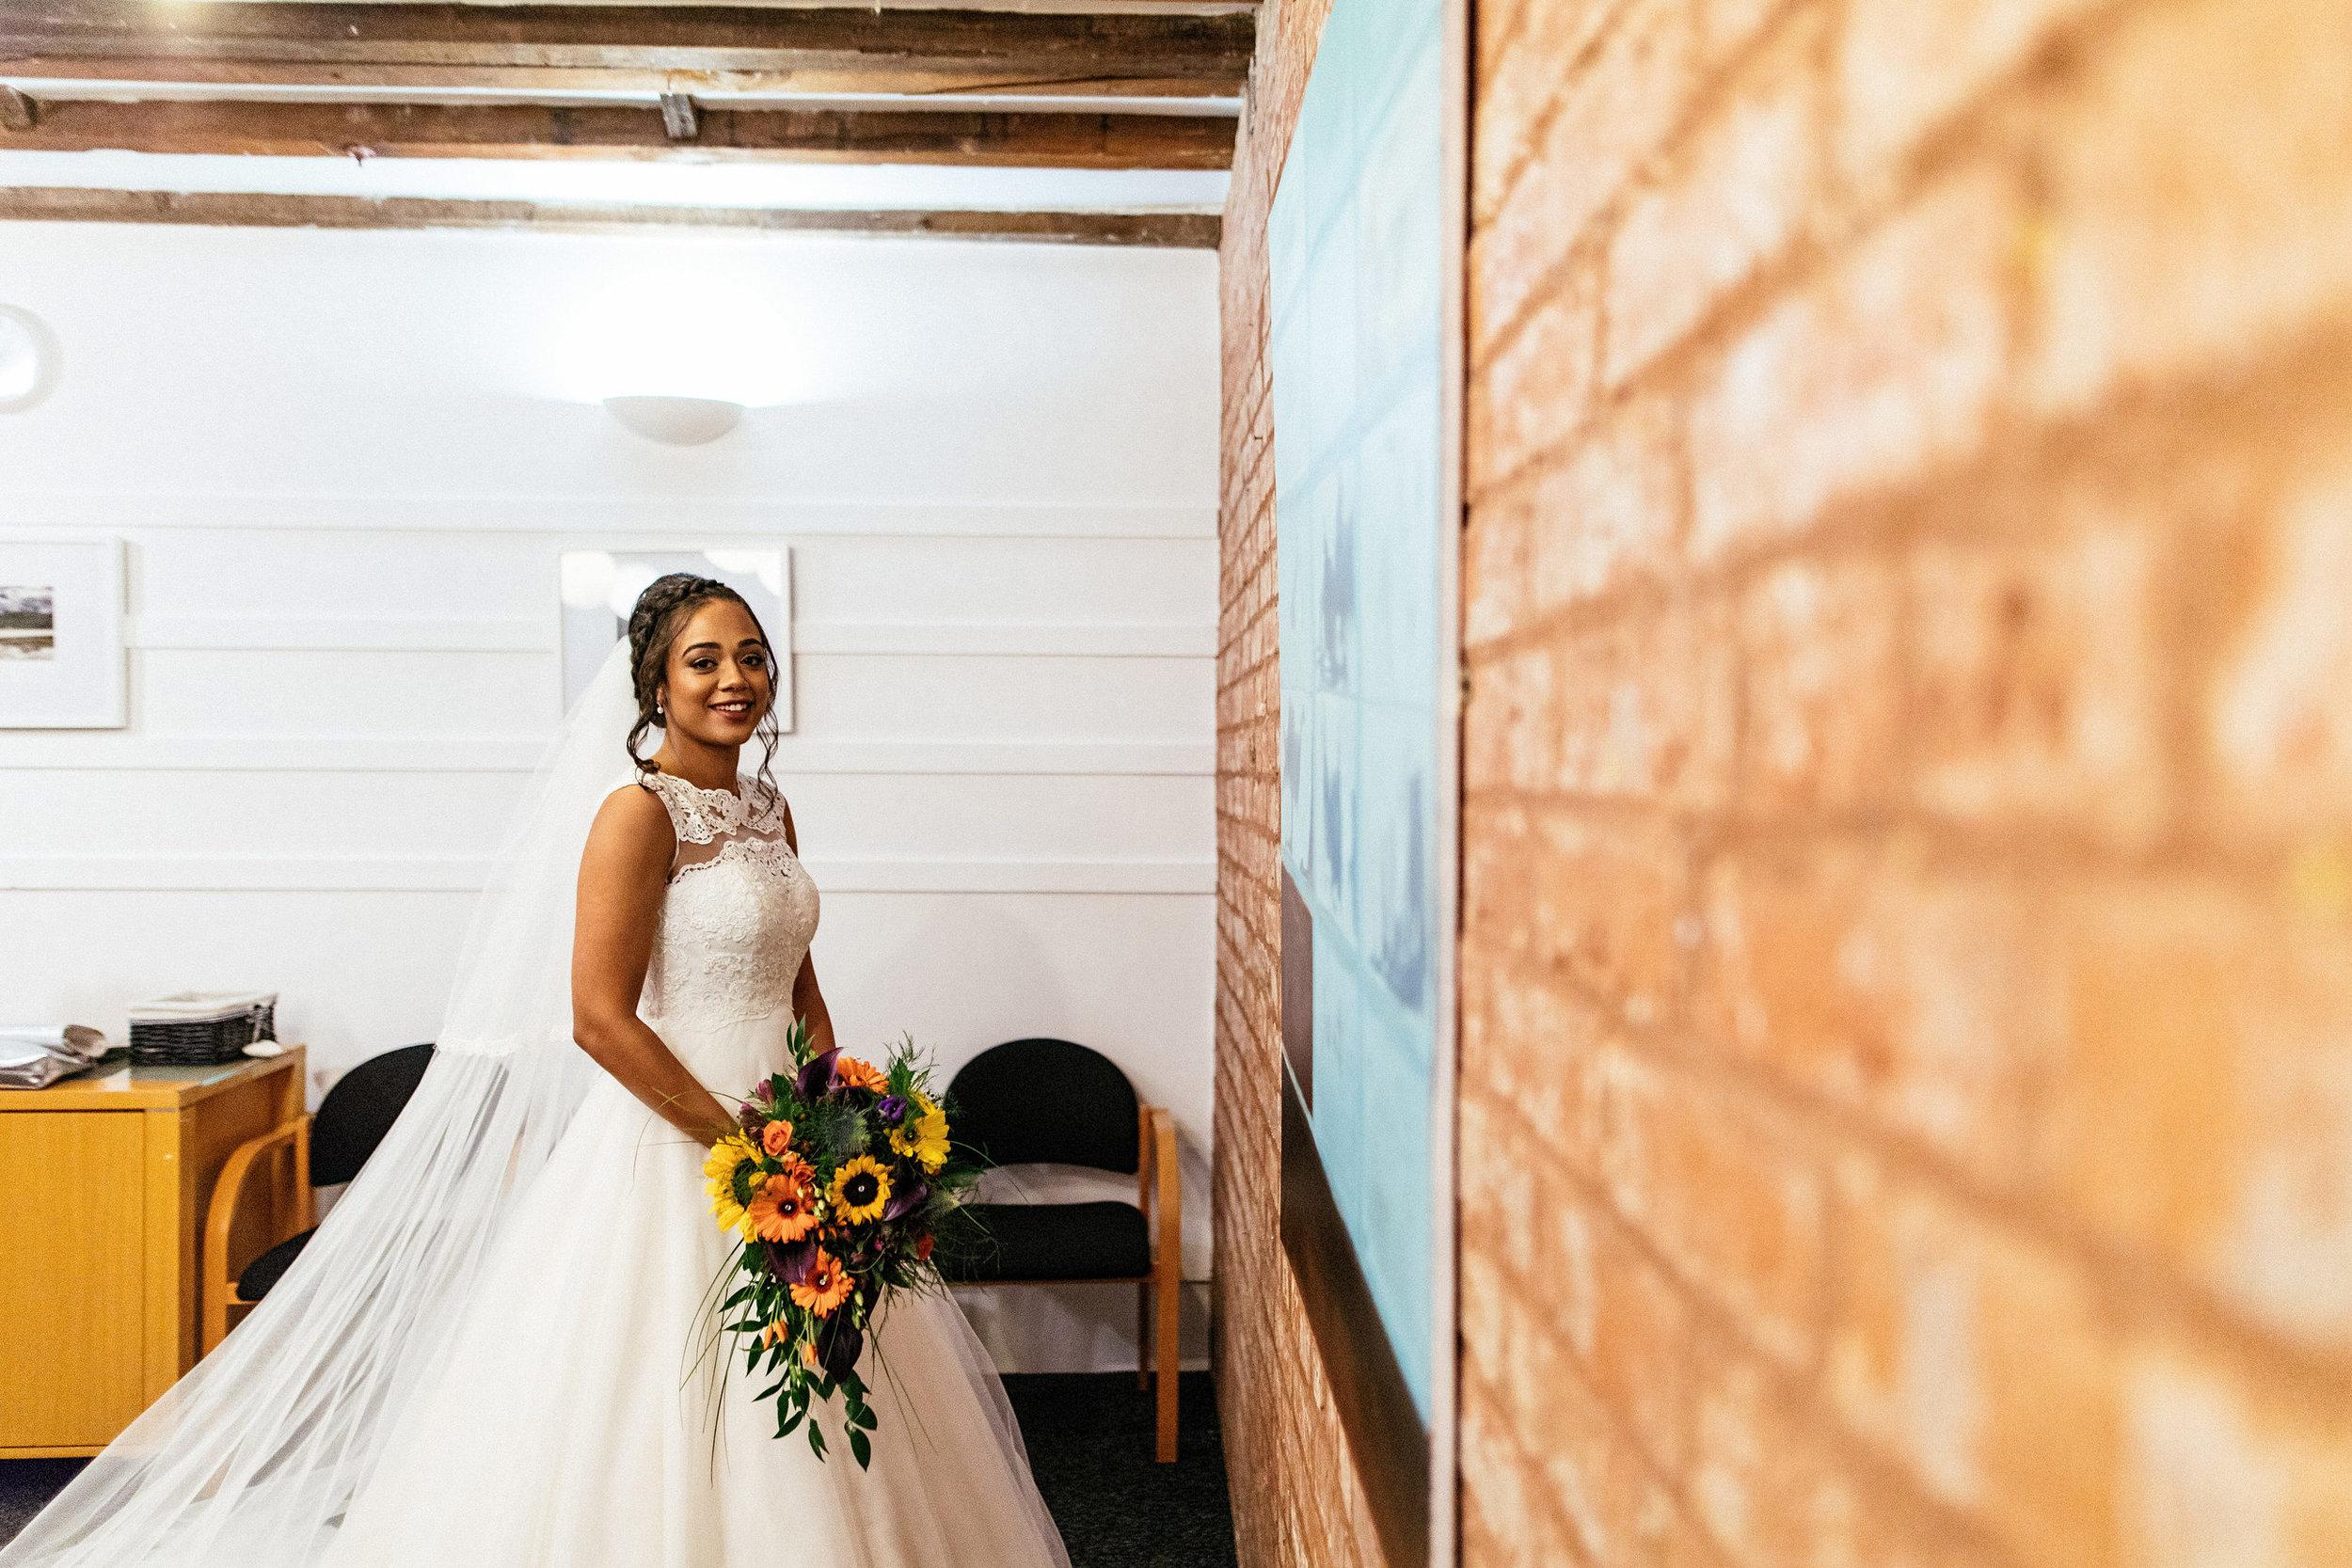 The-Bond-Company-Wedding-Photography-28-1.jpg